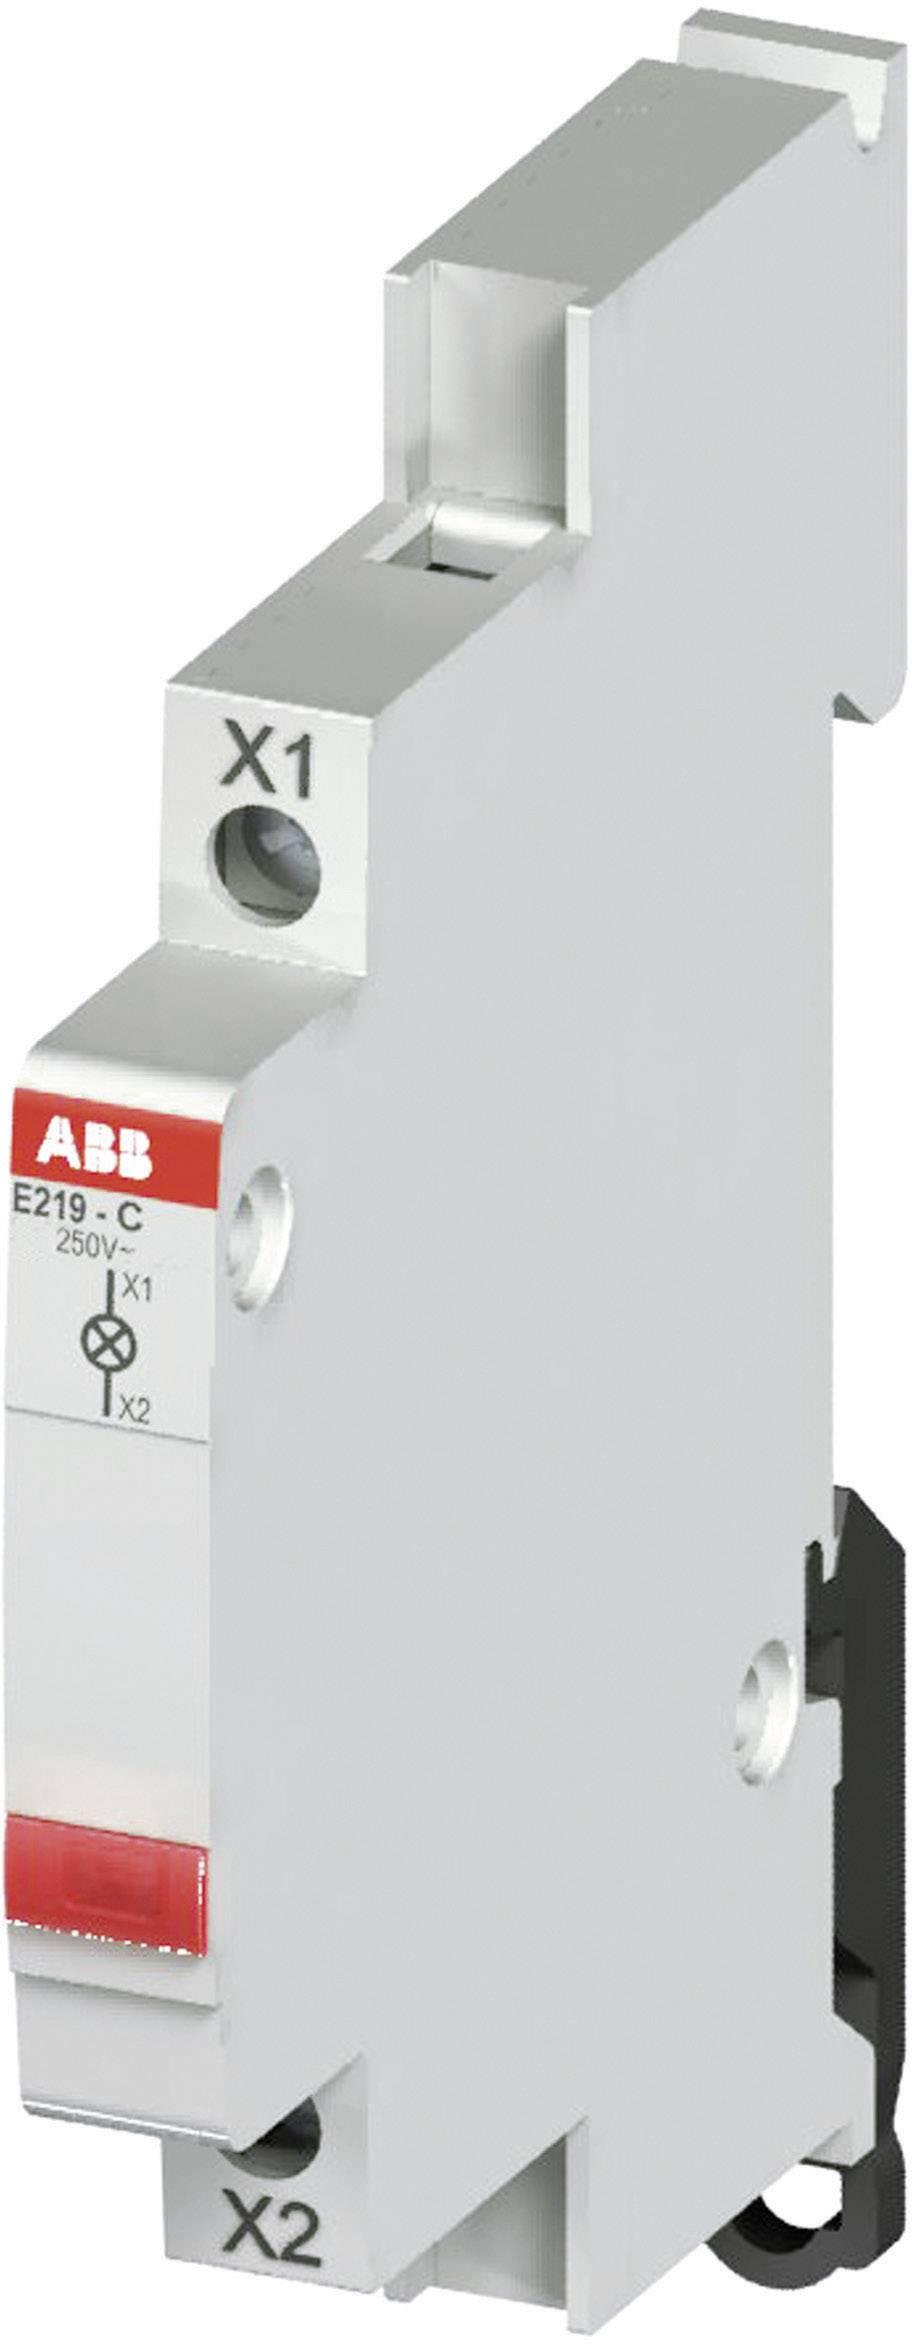 Kontrolka ABB na DIN lištu, 12/48 V, zelená LED, 2CCA703422R0001